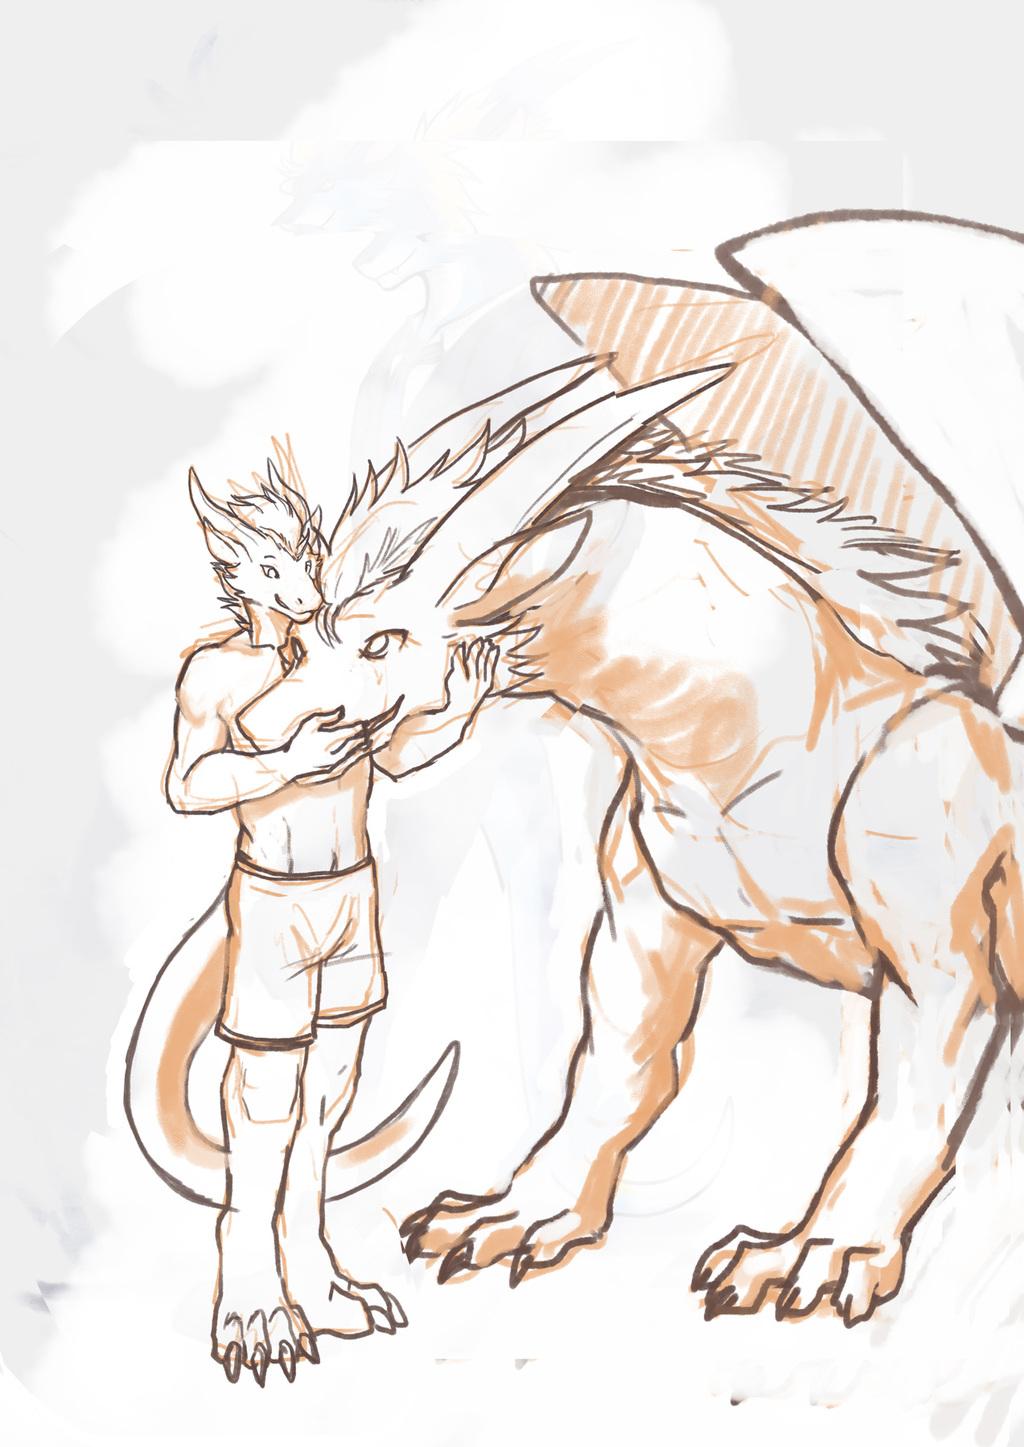 [ByoWT] Sketchbook Page 9 - Two Meet